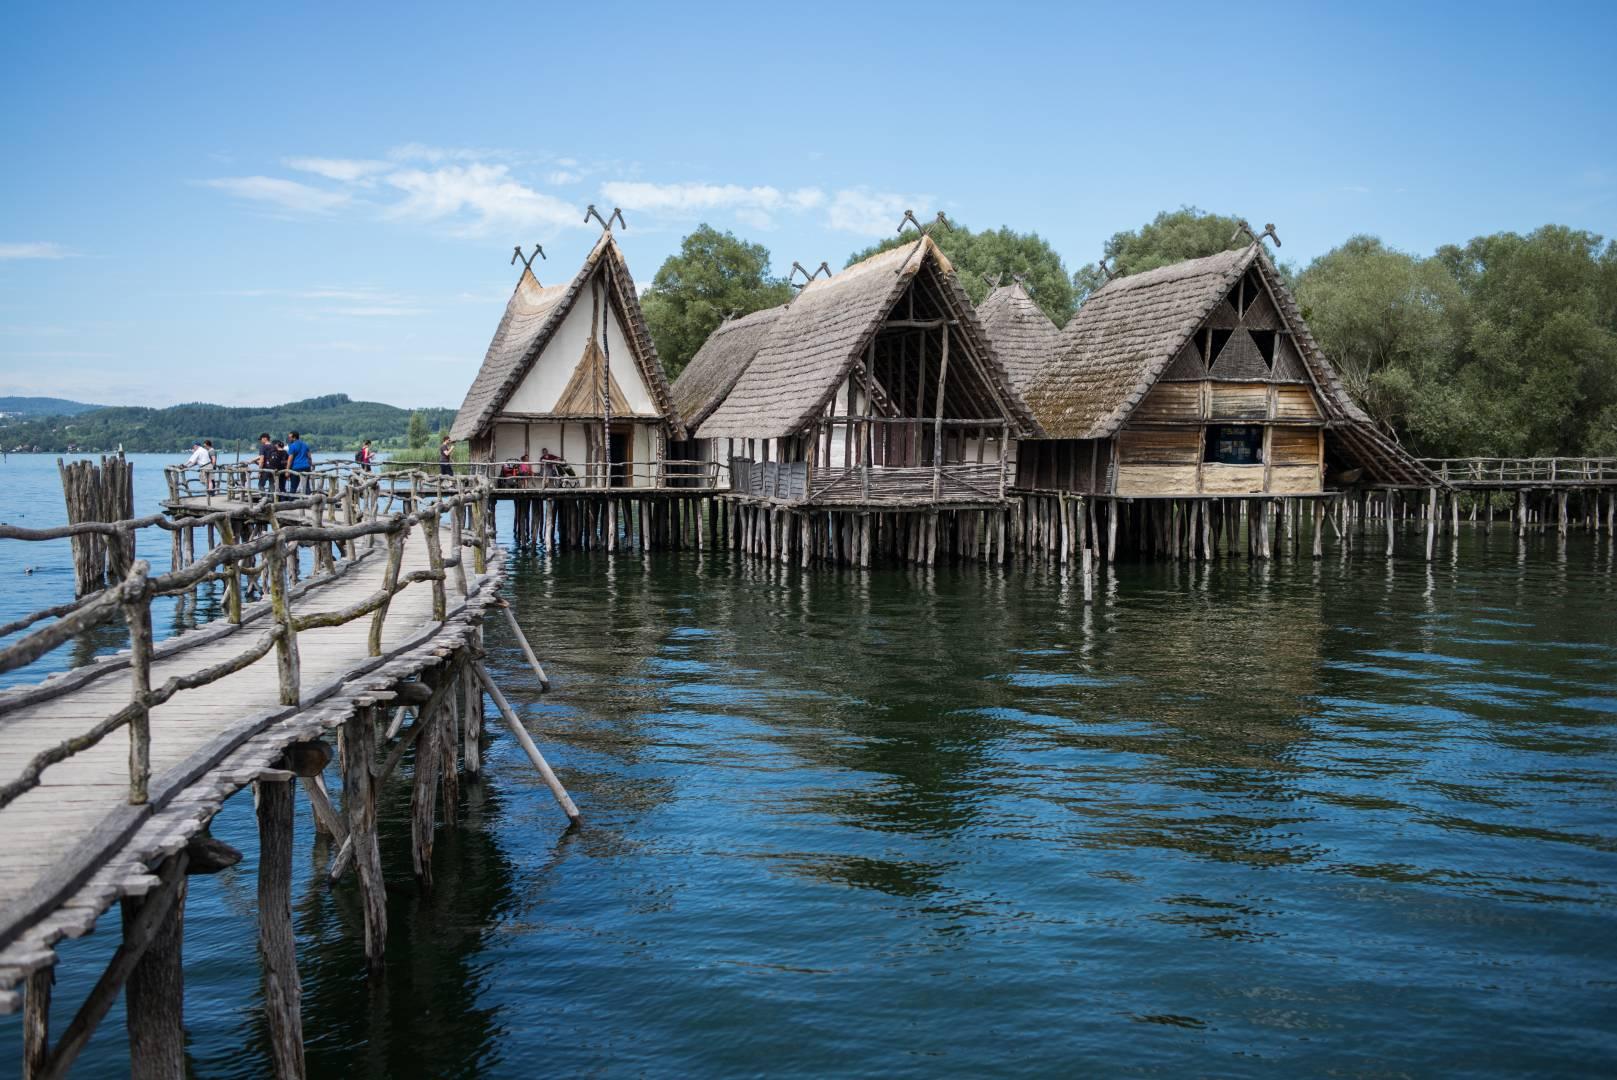 The stone age, as we imagine it. Pile dwellings in Lake Constance, museum in Unteruhldingen. Summarit-M 35/2.4 1/1500 sec, f/2.8, ISO 200 - Leica M Typ 240 (Image ©Jörg-Peter Rau)